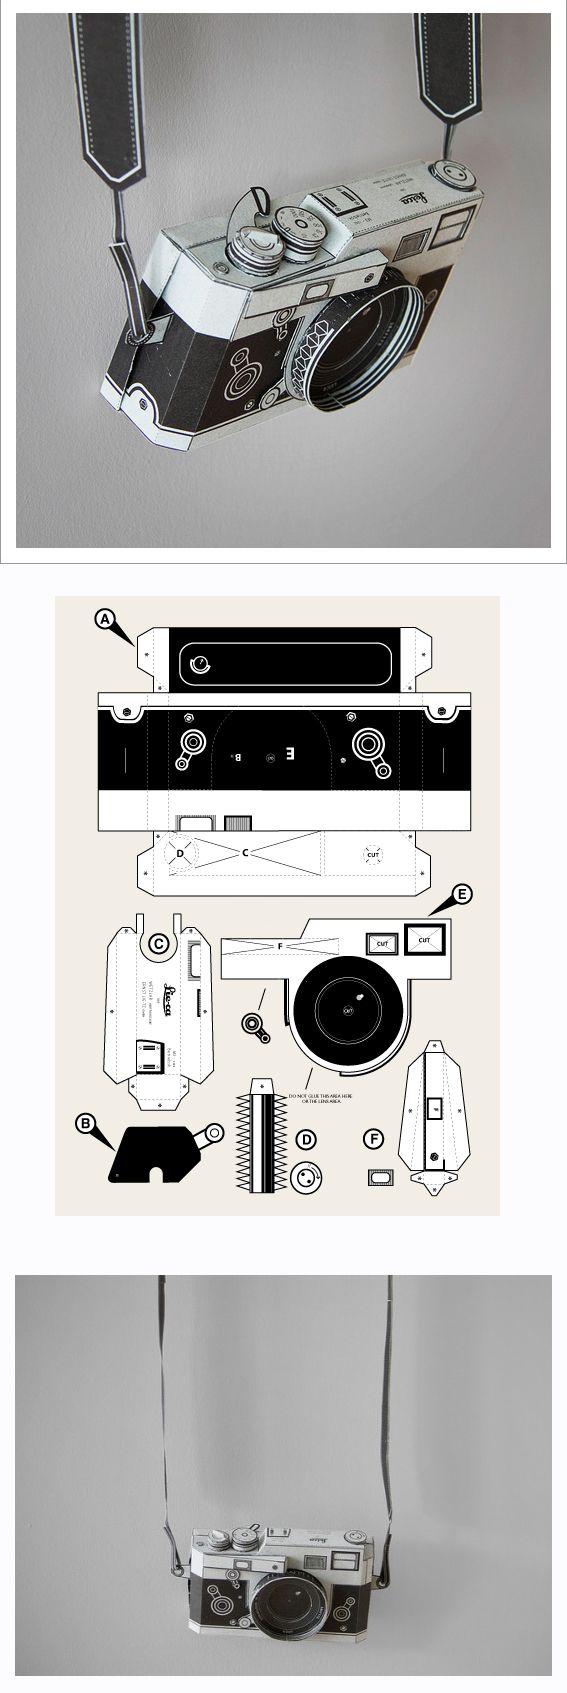 DIY paper Leica camera by Matthew Nicholson PDF £3.00